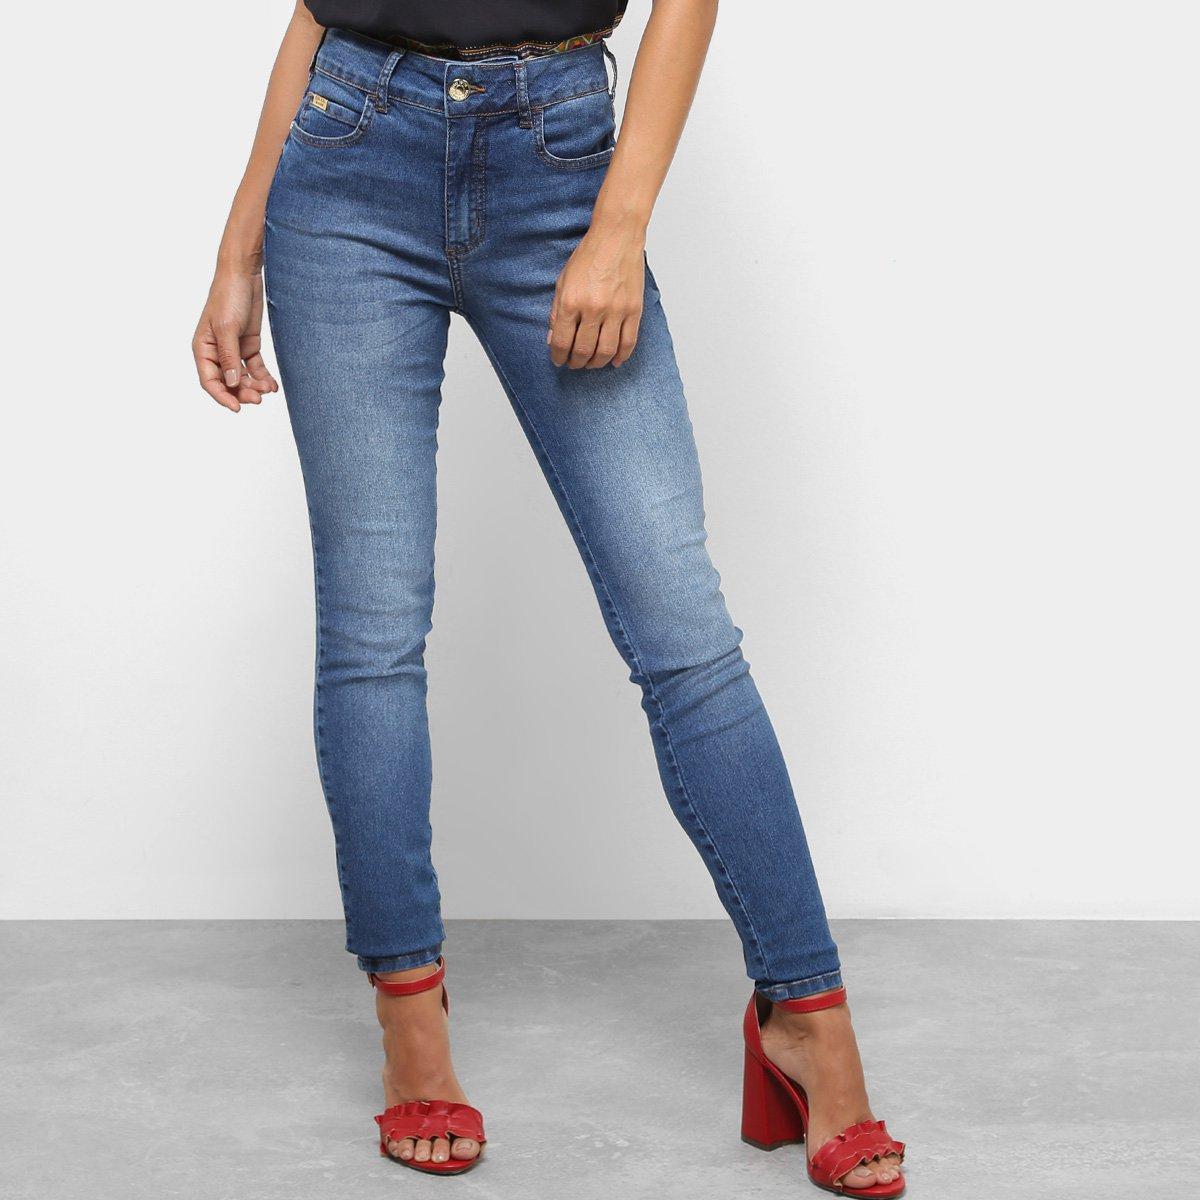 69fc7ddcc Calça Jeans Skinny Colcci Bia Feminina | Netshoes